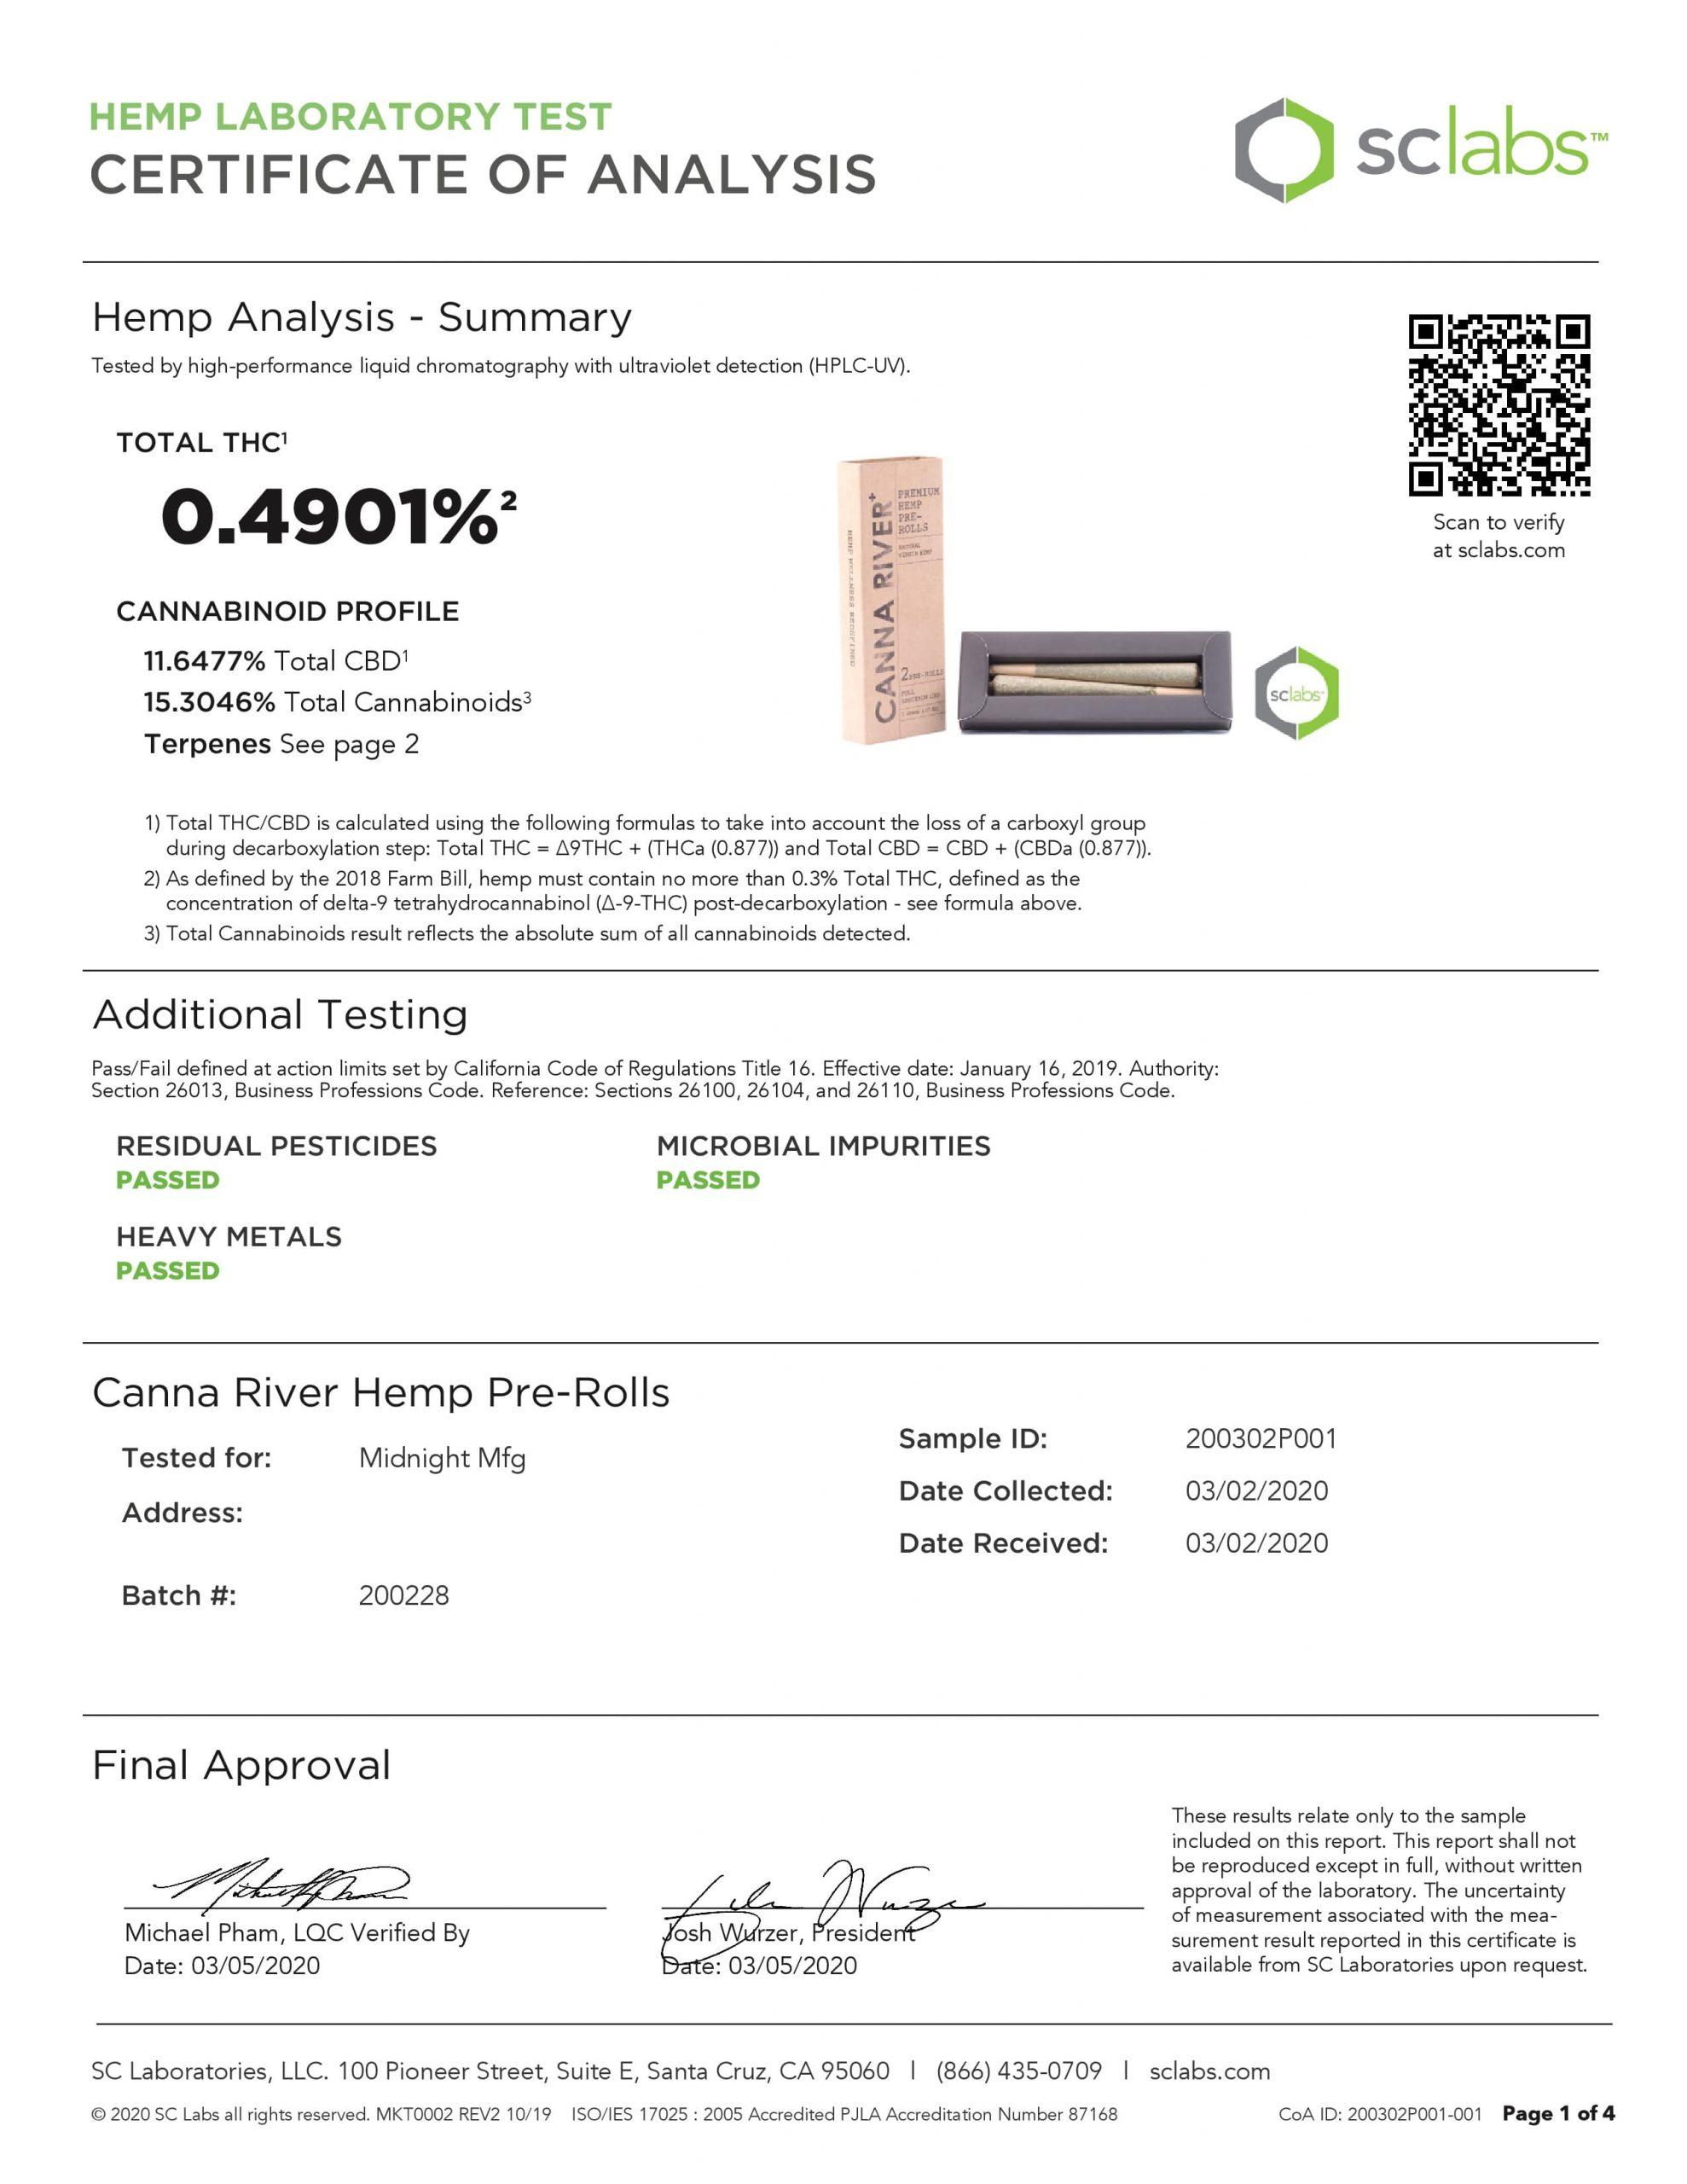 CANNA RIVER CBD Premium Hemp Pre-Rolls Lab Report